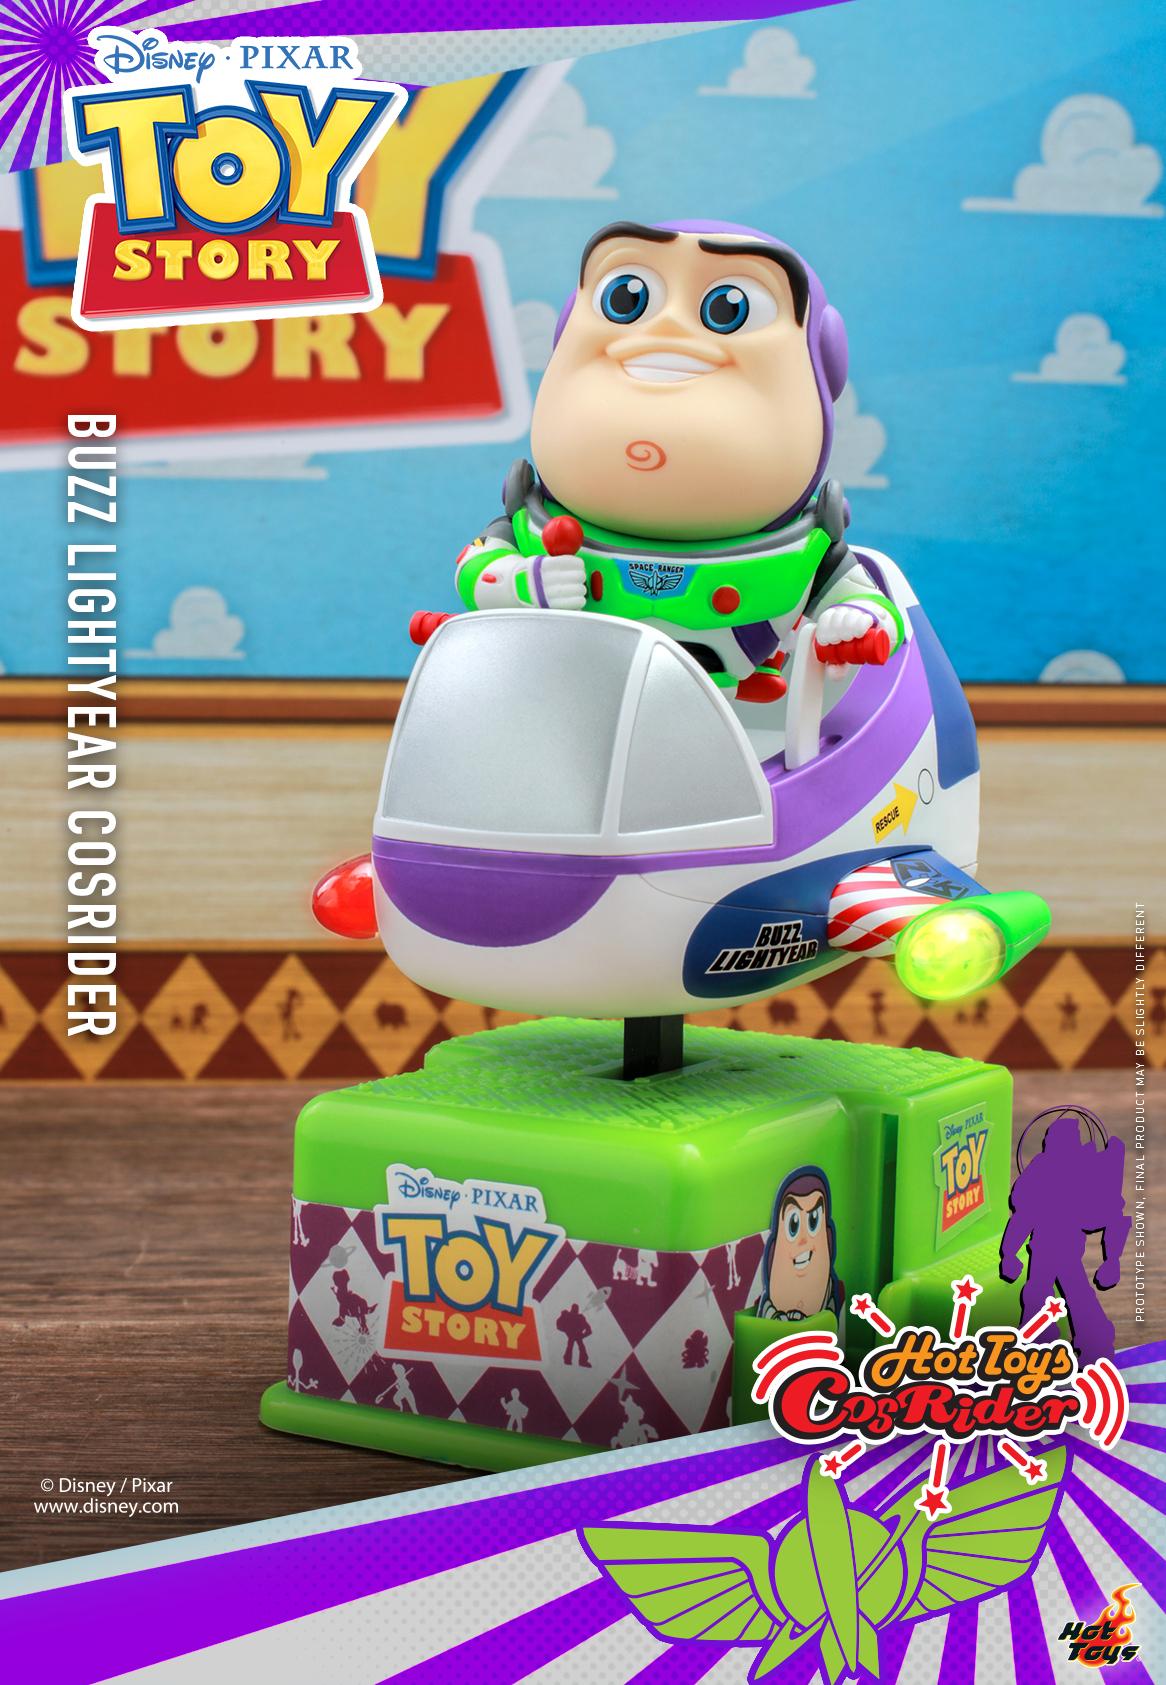 Hot Toys - Toy Story - Buzz Lightyear CosRider_PR1